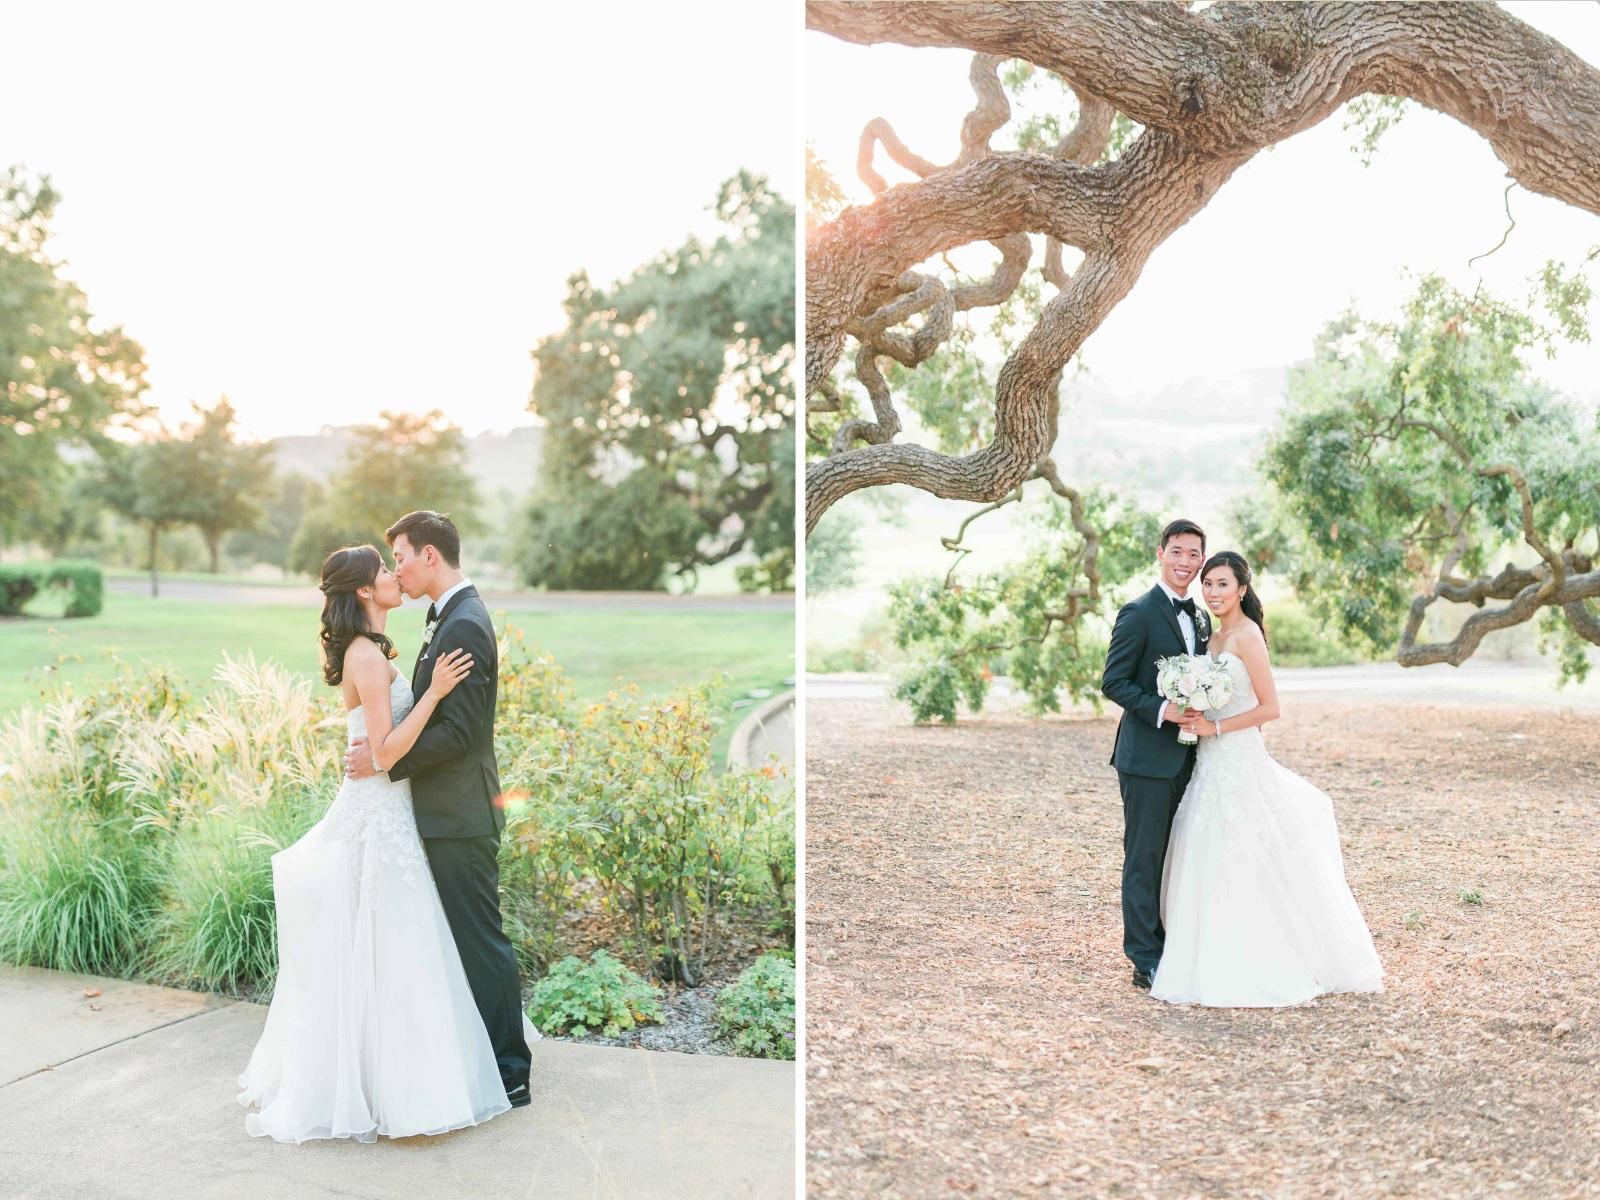 Ruby Hill Wedding Photos by JBJ Pictures - San Francisco Wedding Photographer - Pleasanton Wedding Venue (43.5).jpg